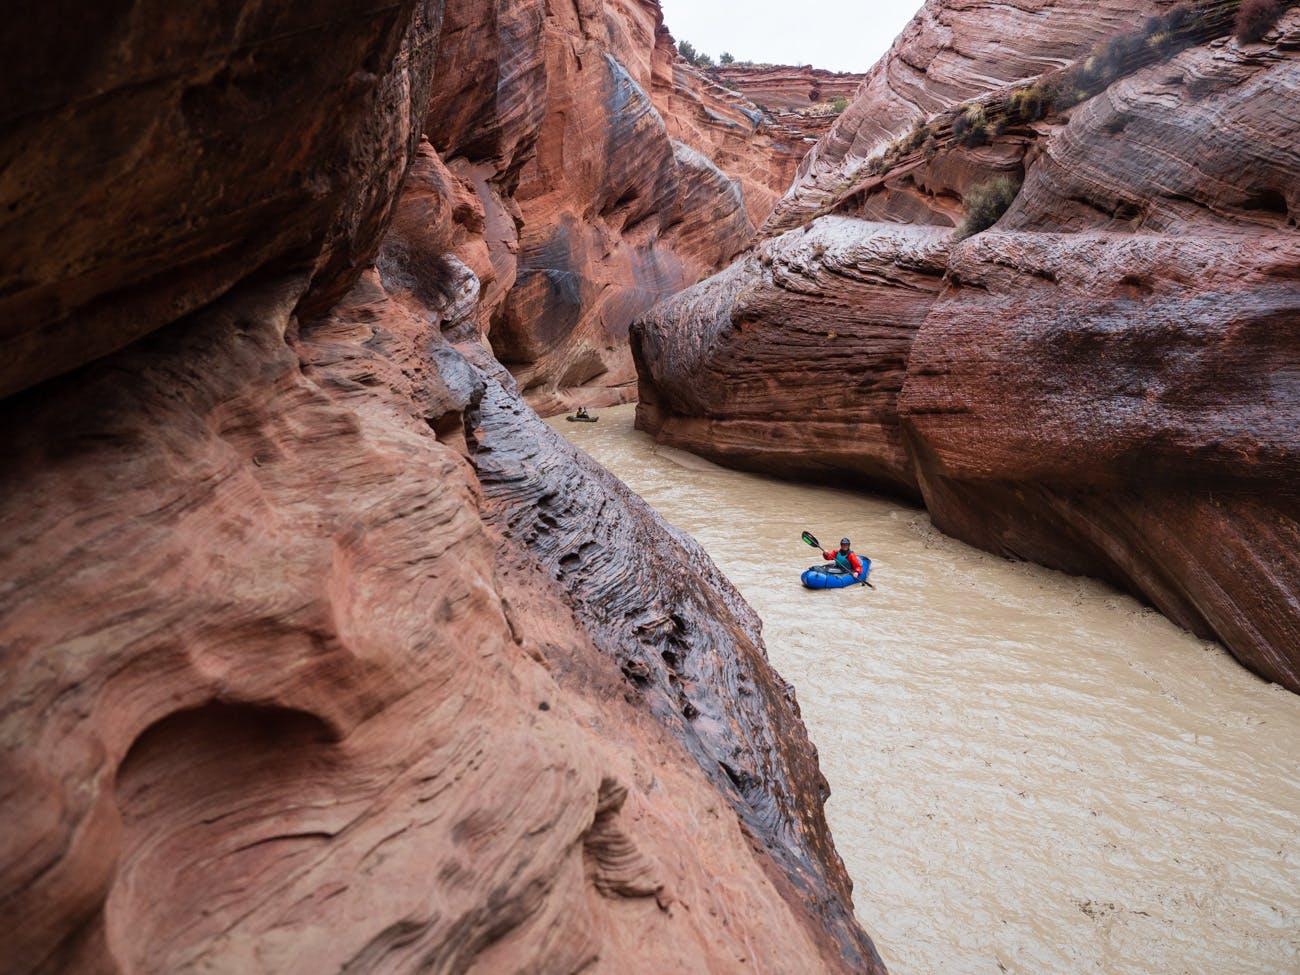 Jesse Selwyn, Desert packrafting